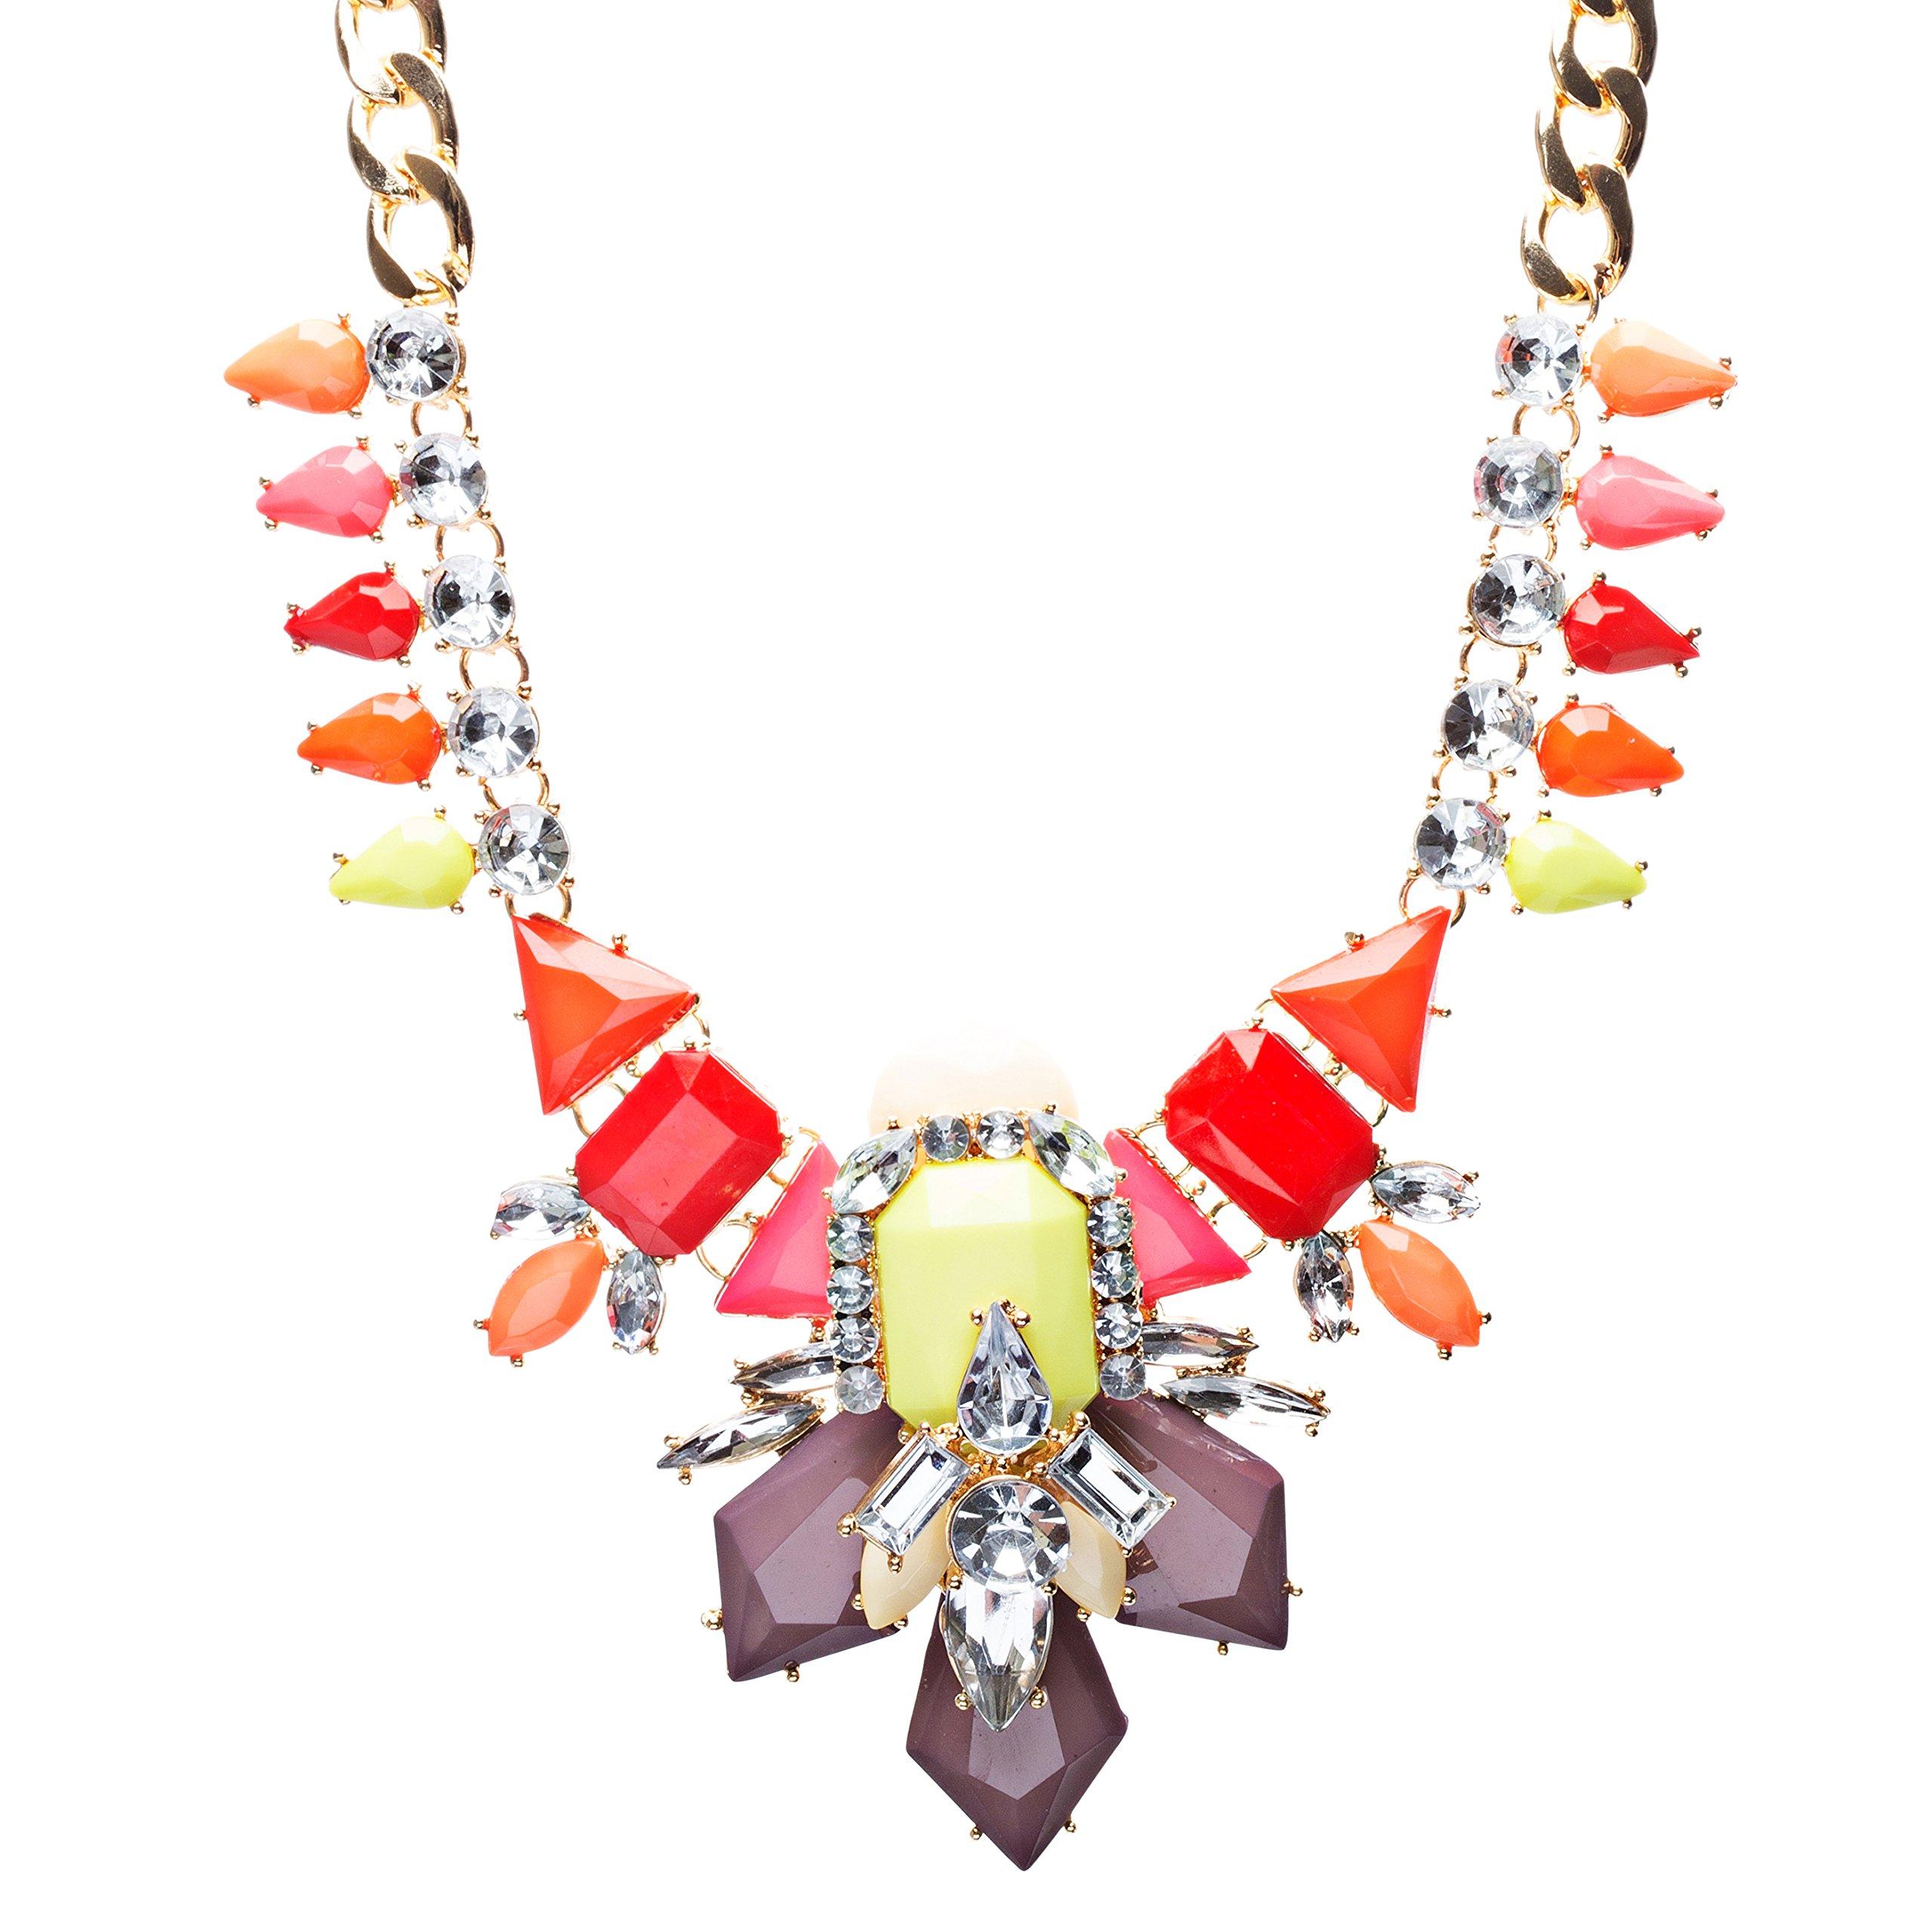 Audacious Trendy Crystal Rhinestone Statement Jewelry Necklace N73 Multi